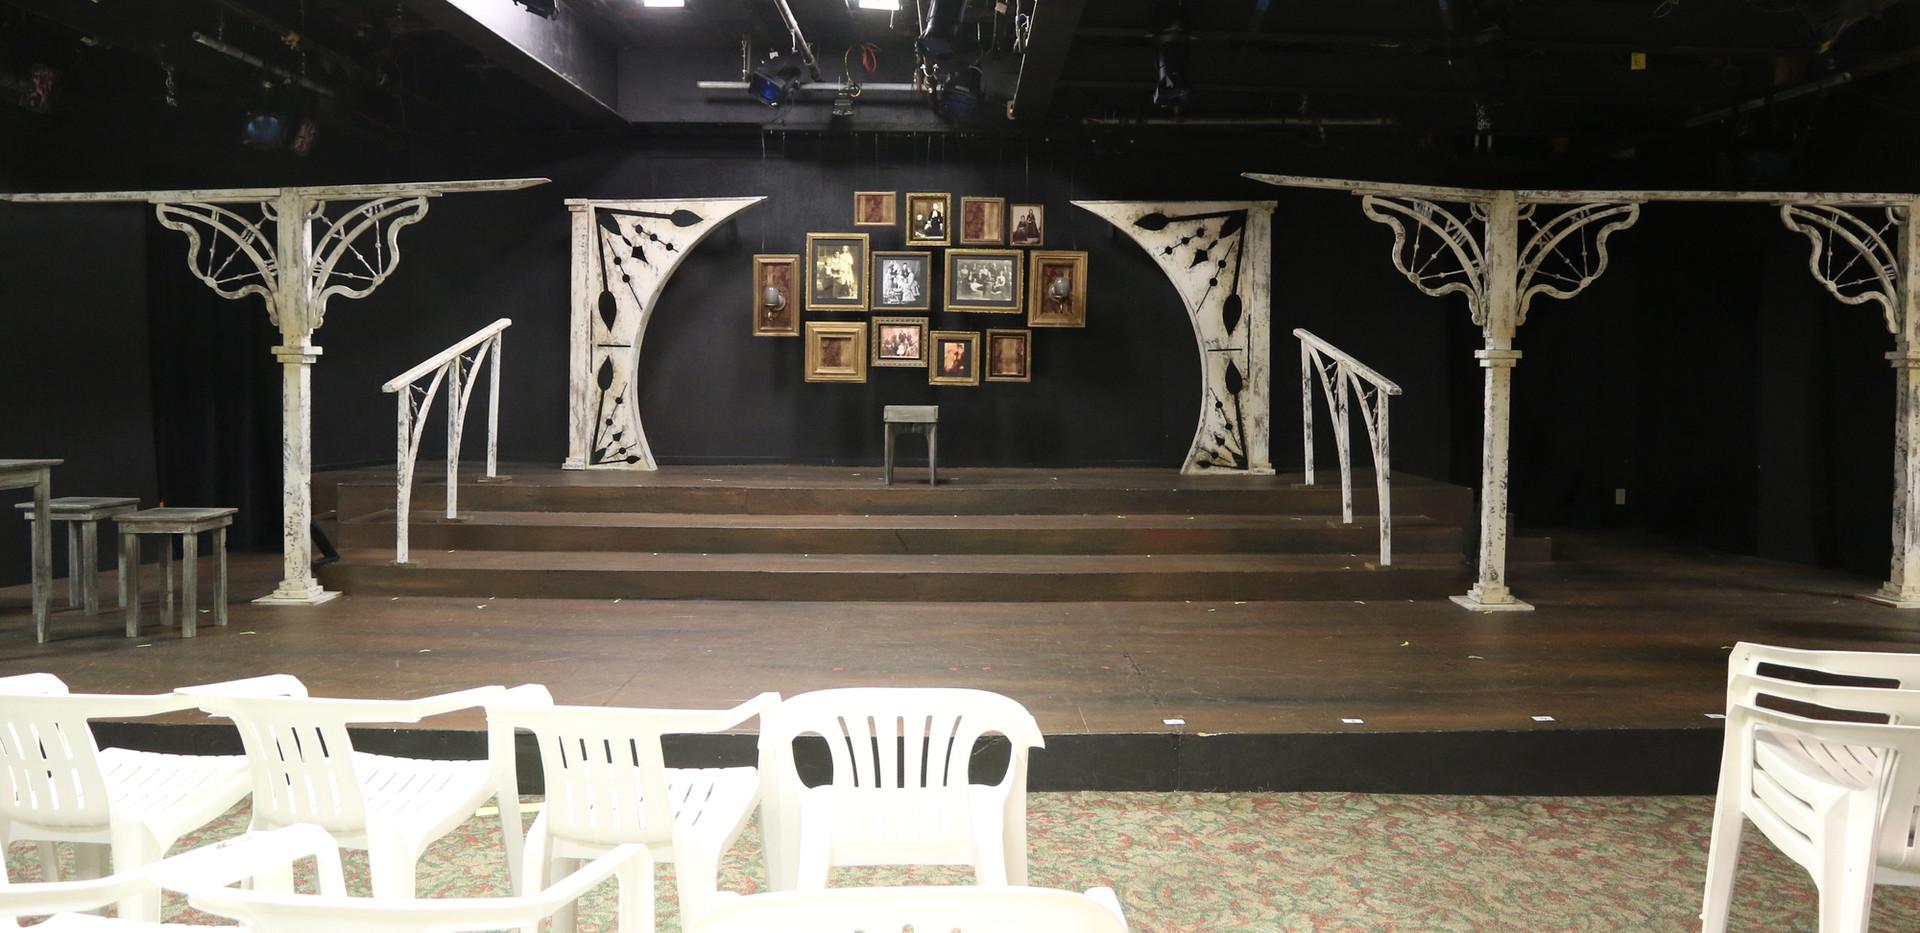 The Cabaret Theater